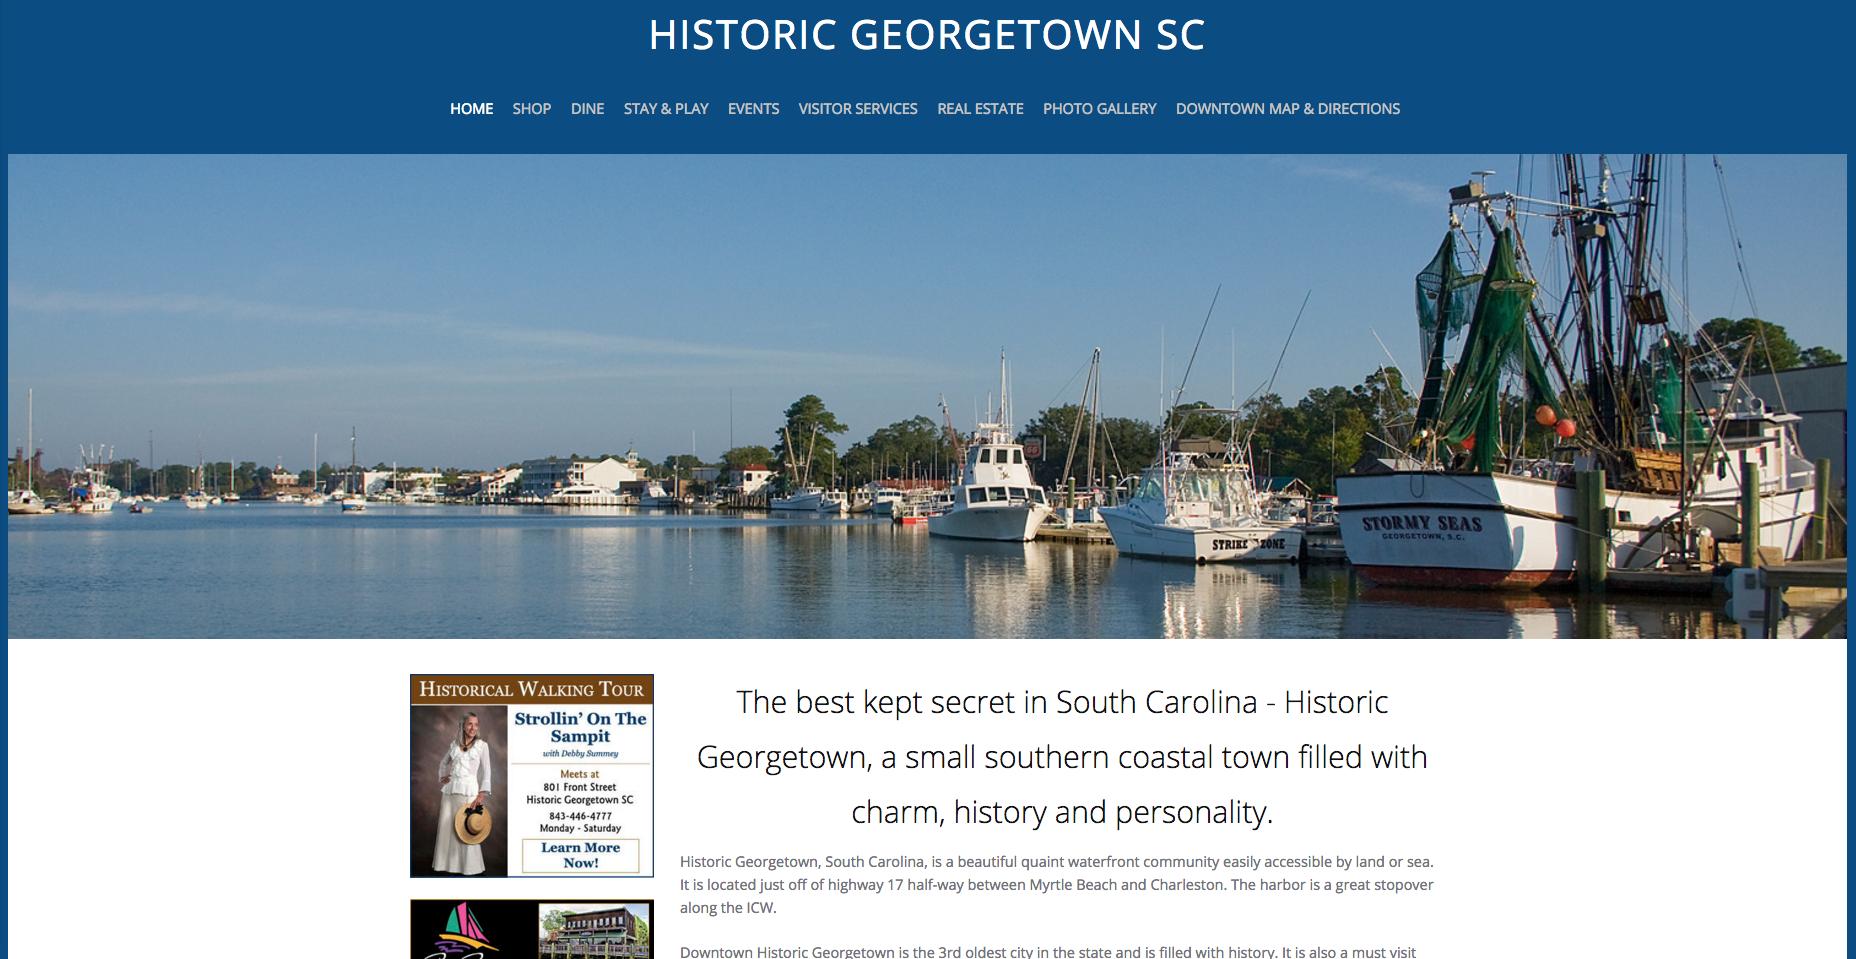 Historic Georgetown SC